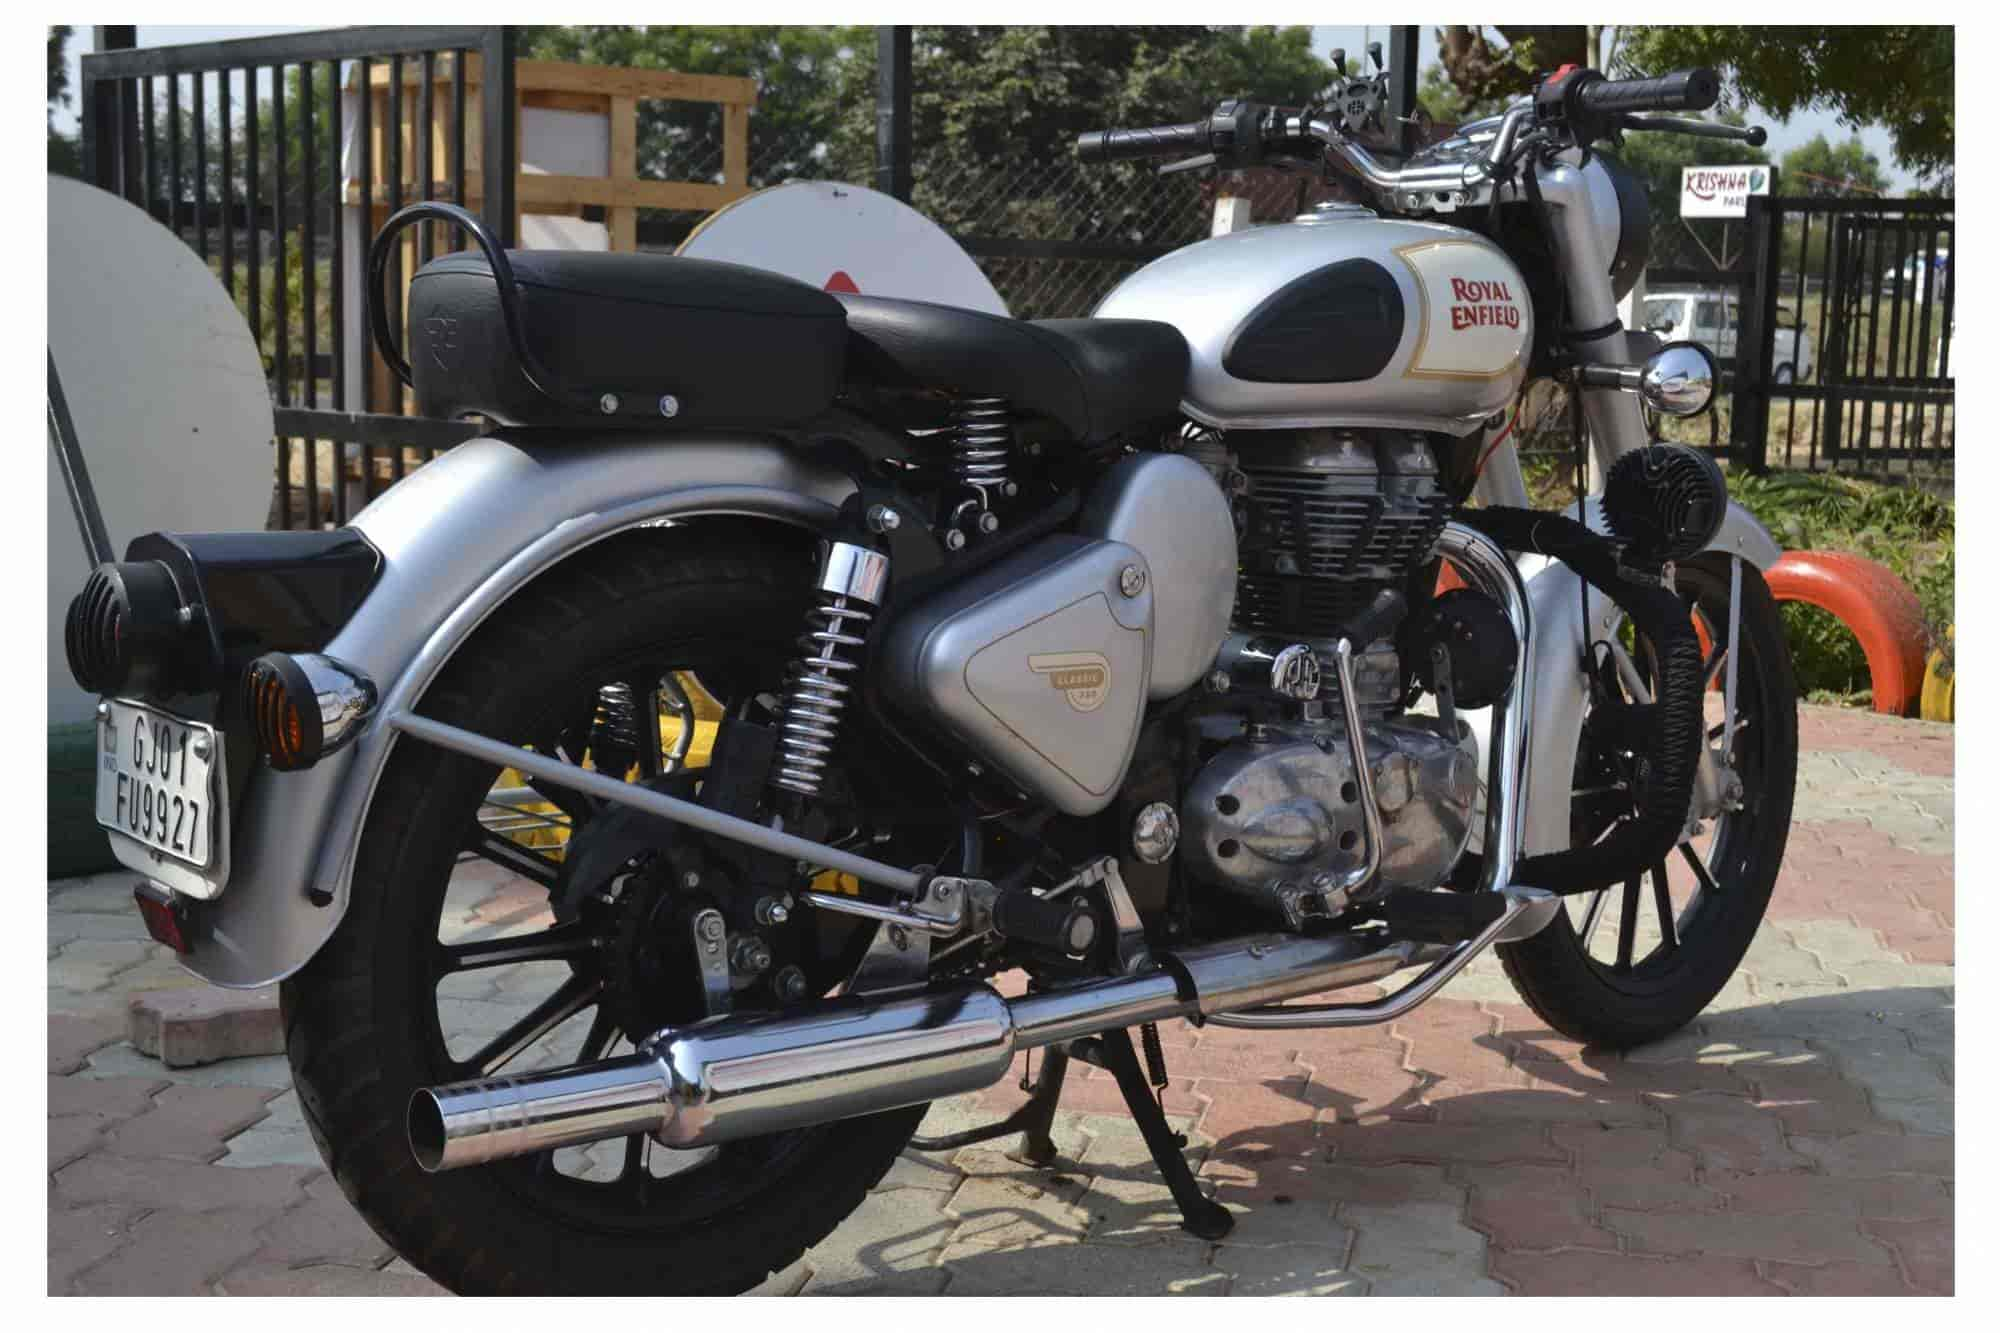 bullet on rent bopal bike on rent in ahmedabad justdial